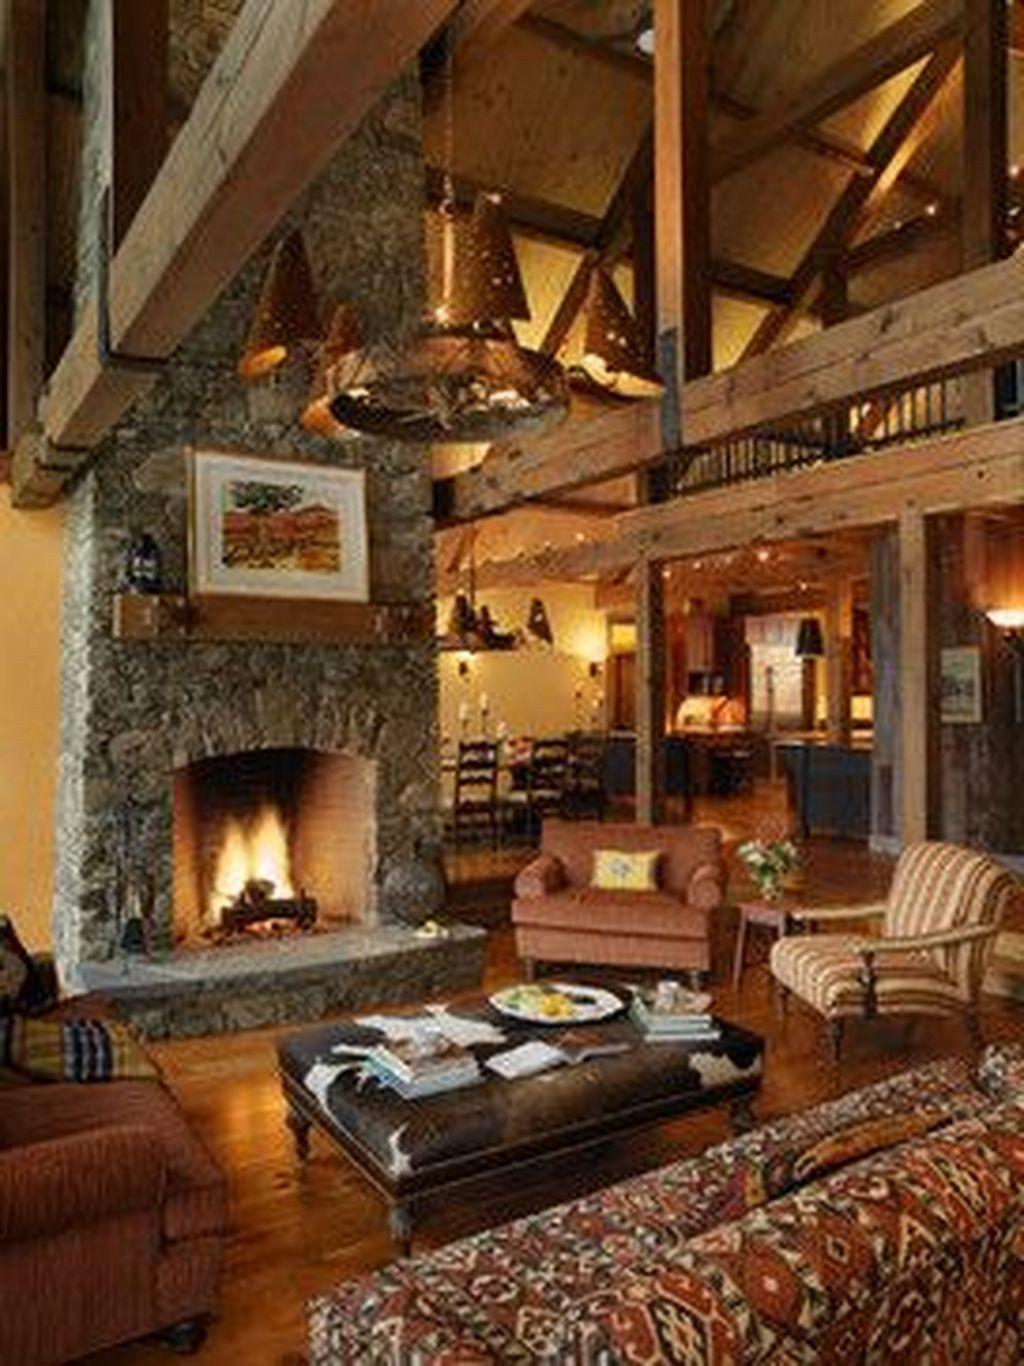 Amazing Living Room Designs: 46 Amazing Lodge Living Room Decorating Ideas